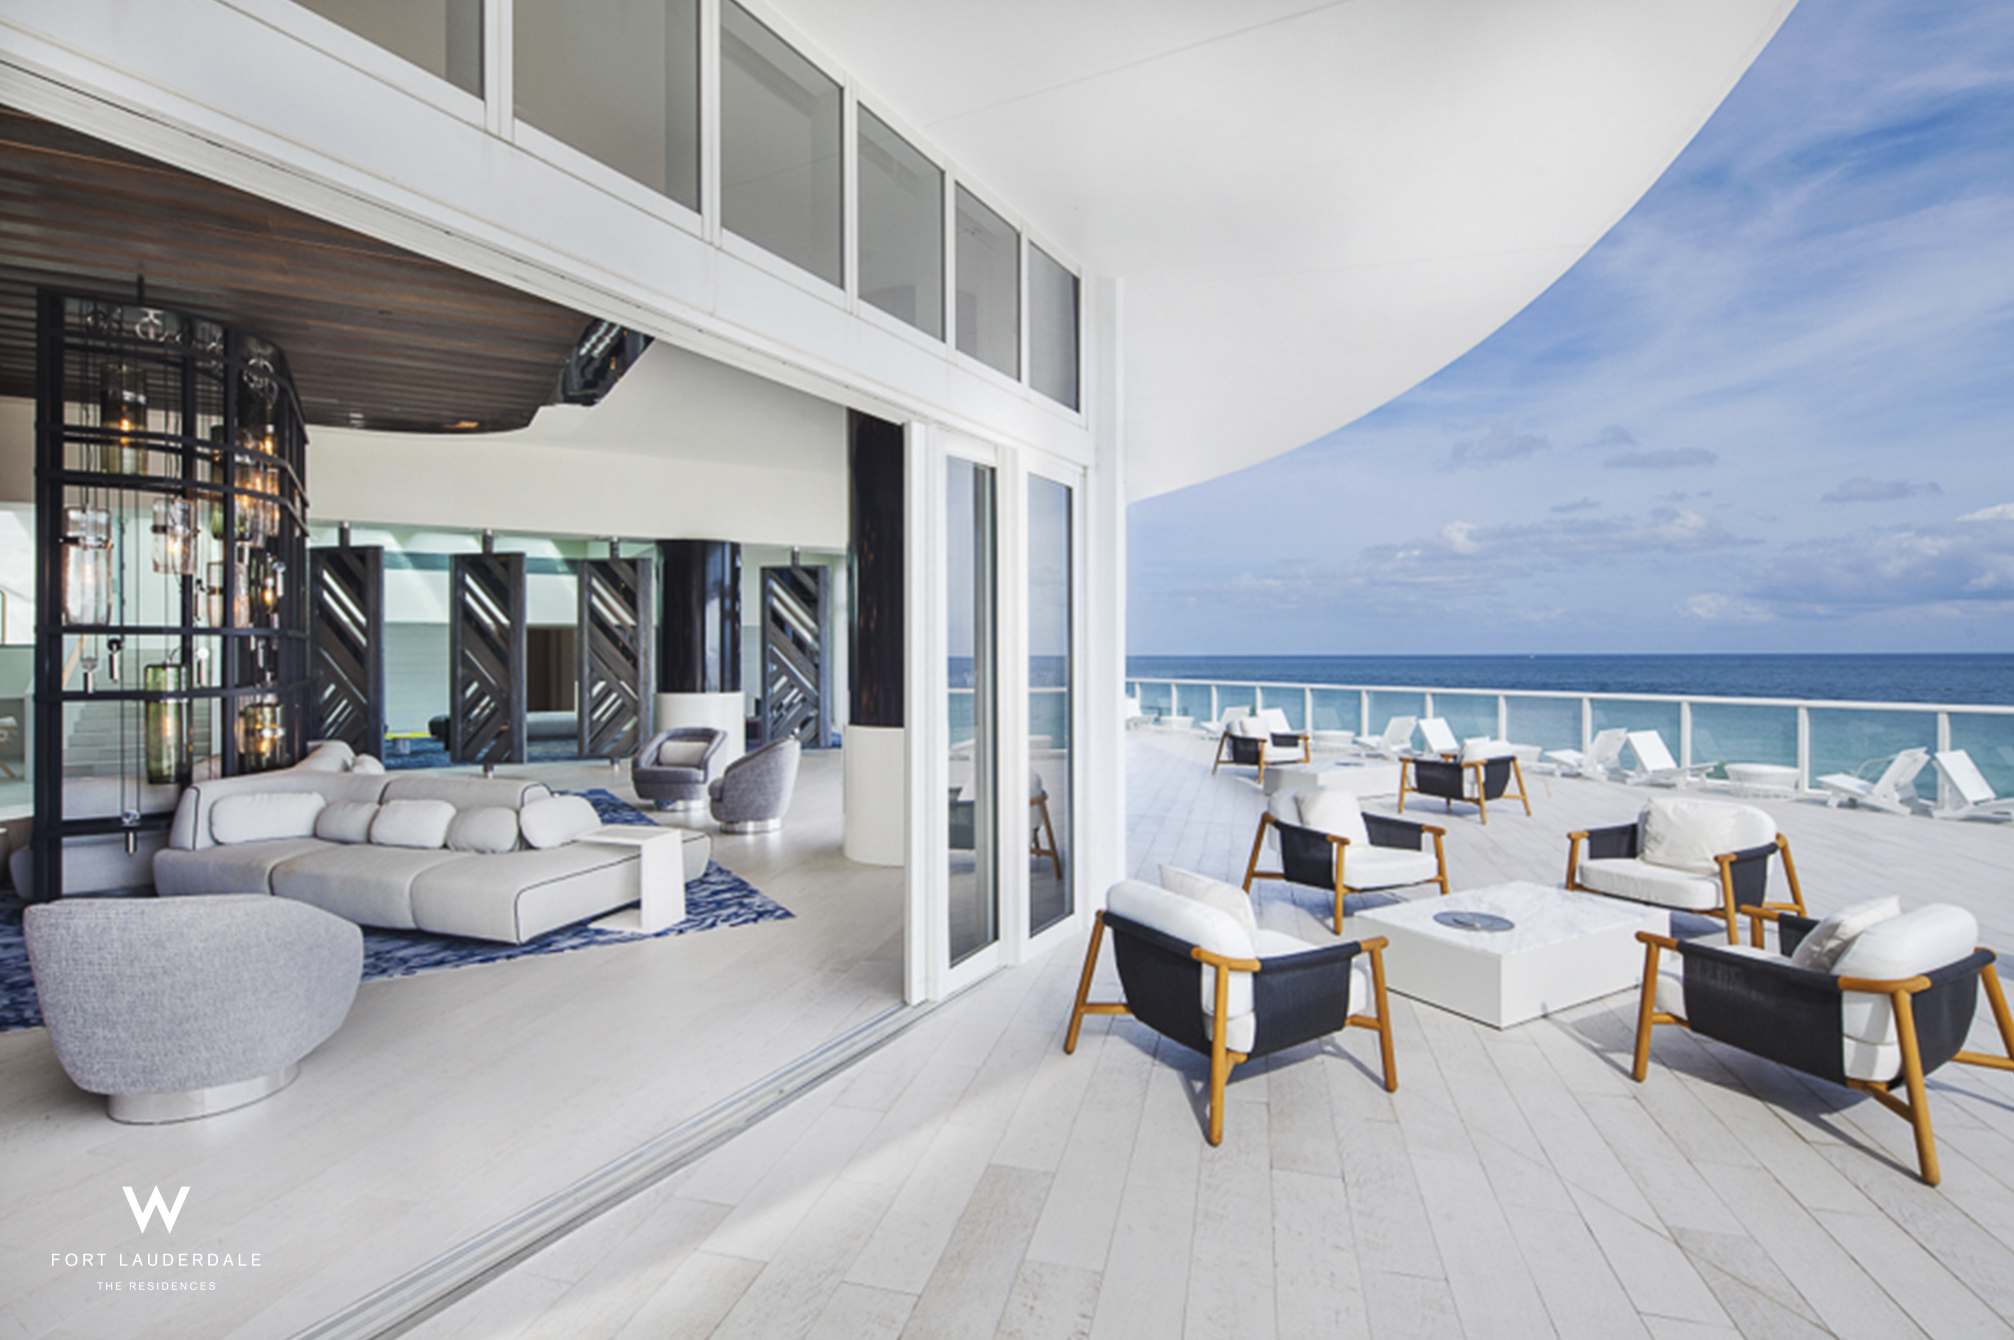 W Ft. Lauderdale Living Room Terrace